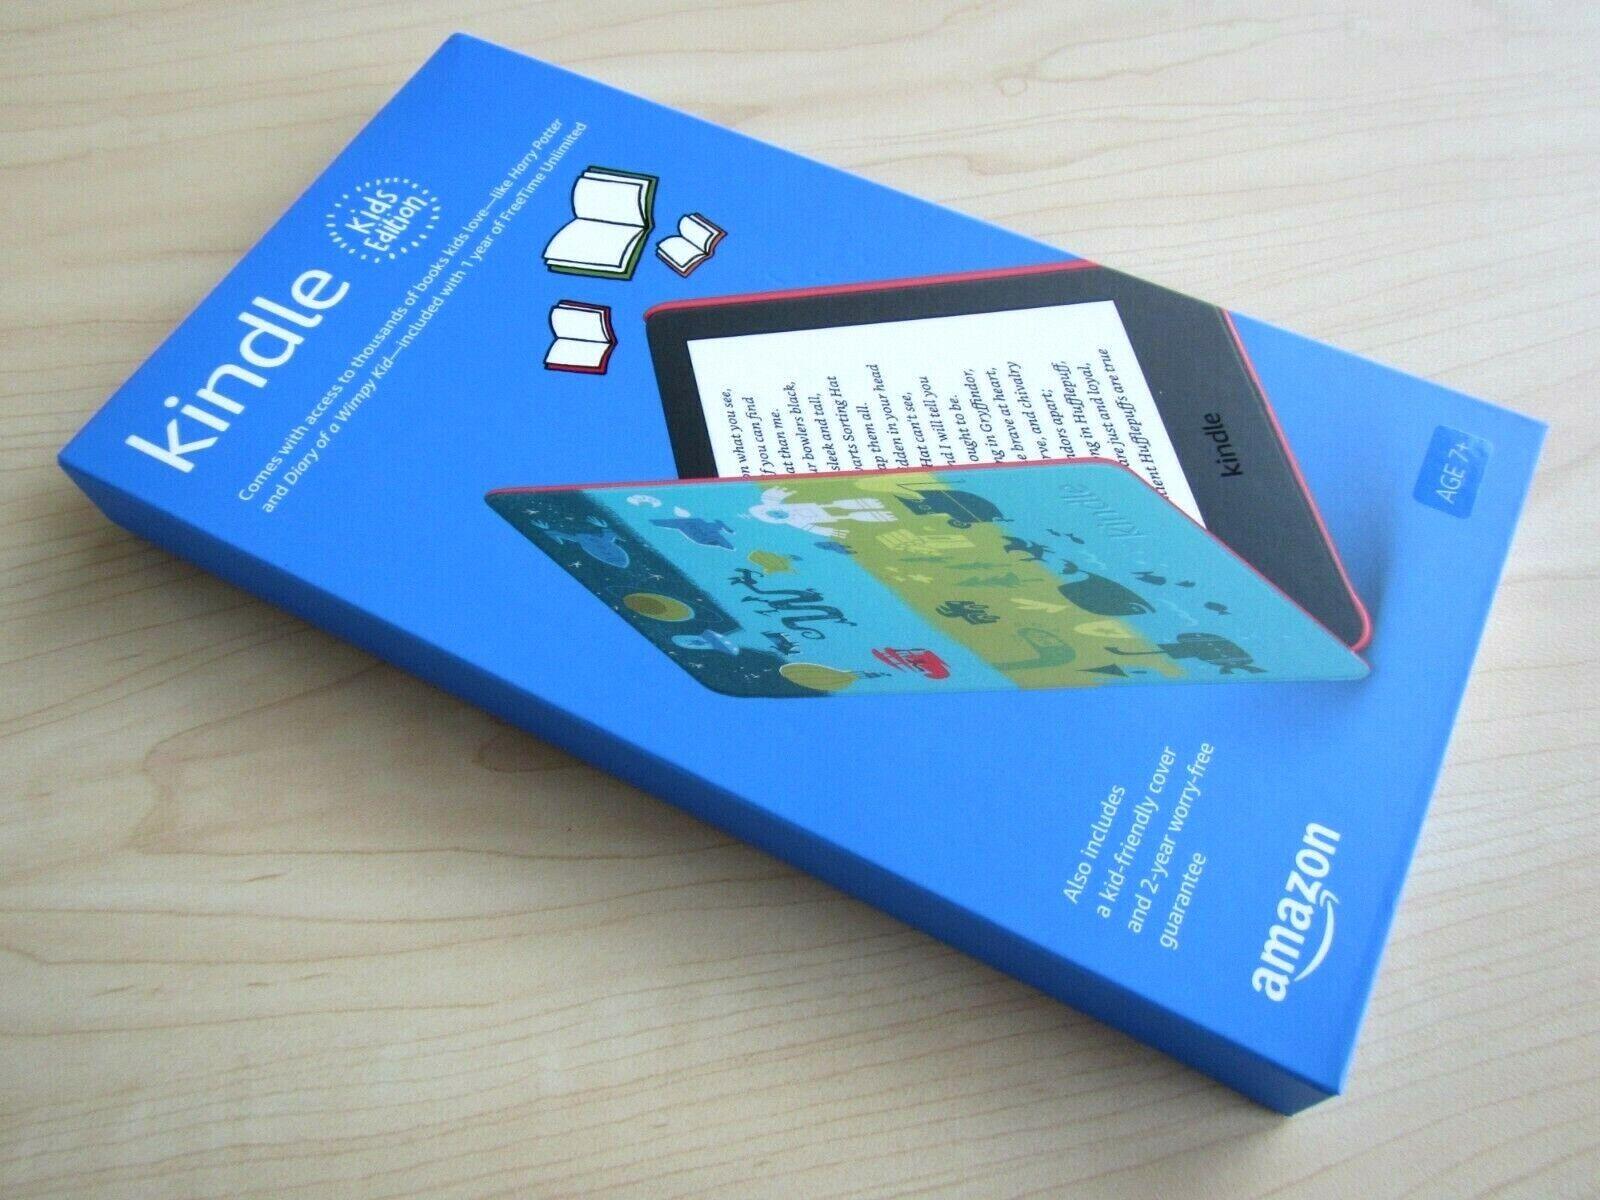 NEW 2020 AMAZON KINDLE KIDS EDITION E-BOOK E-READER TABLET 8 GB 6